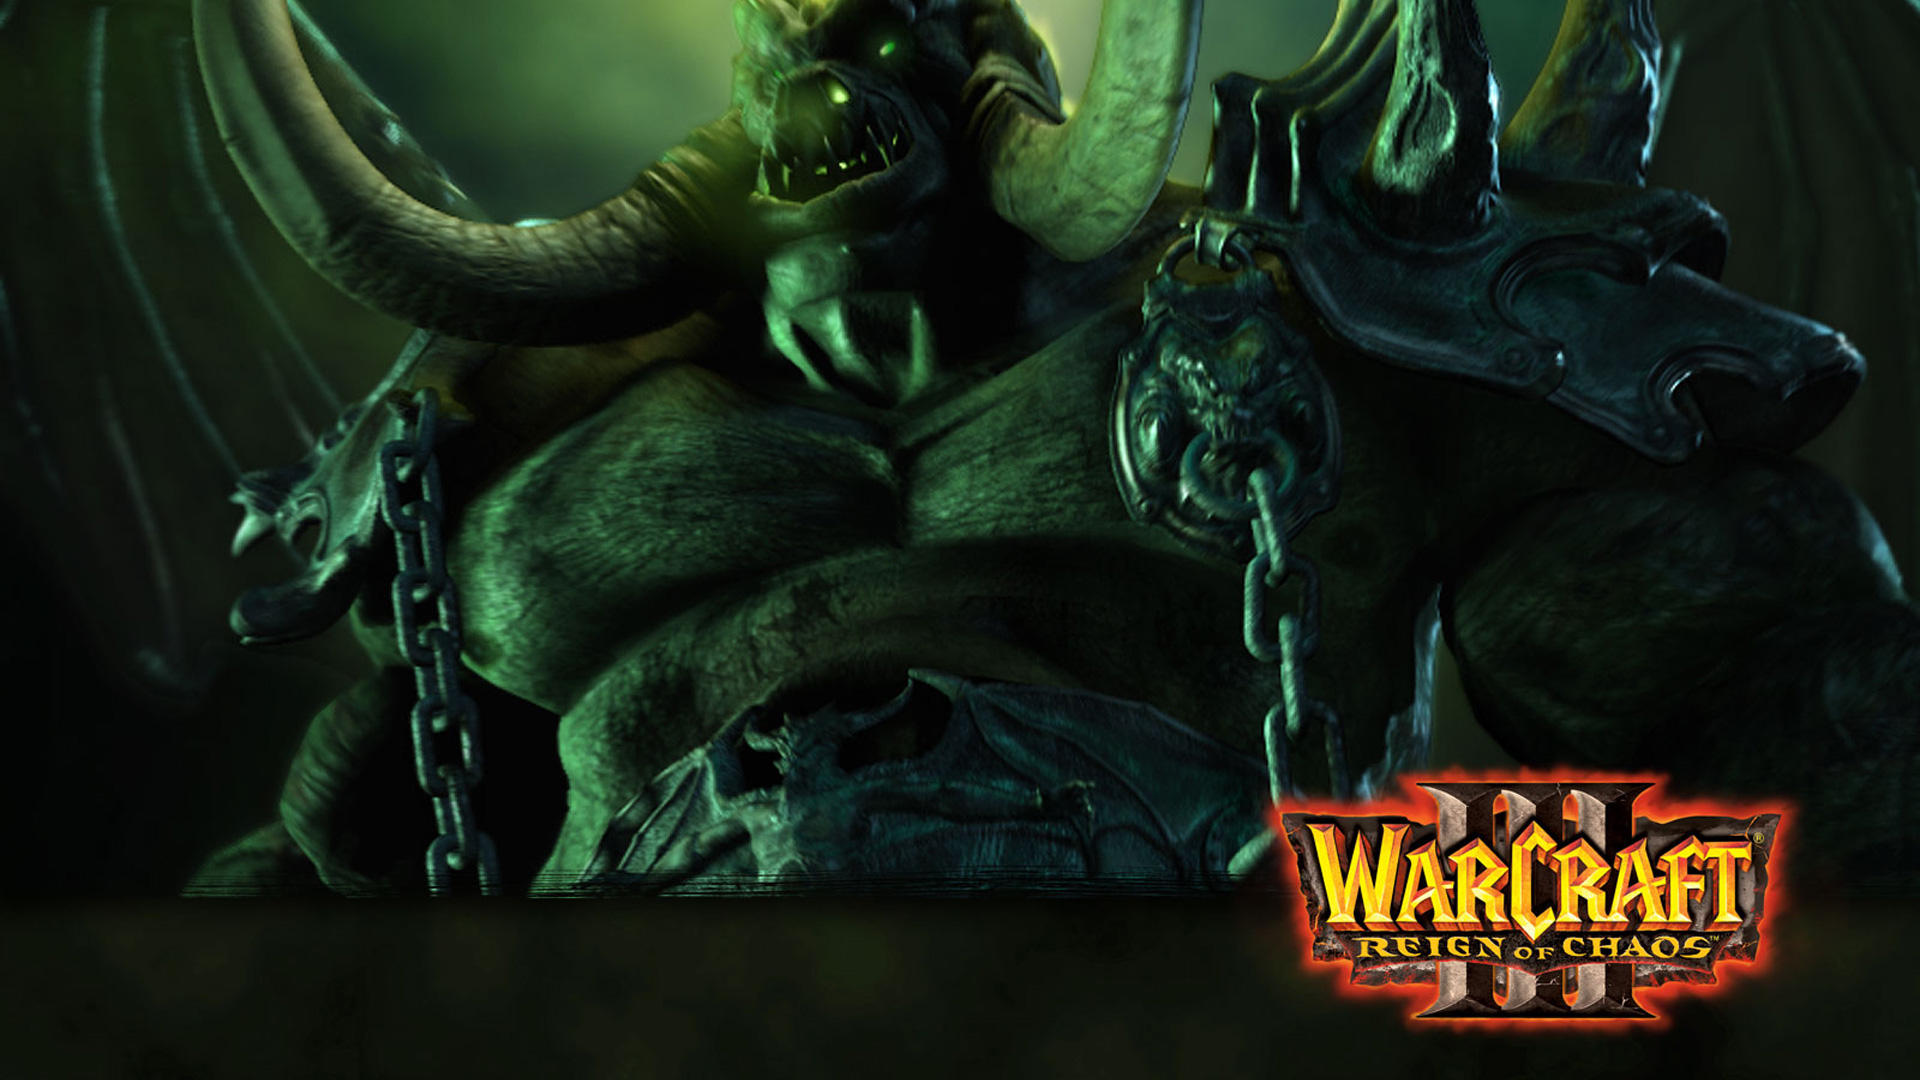 Free Warcraft III Wallpaper in 1920x1080